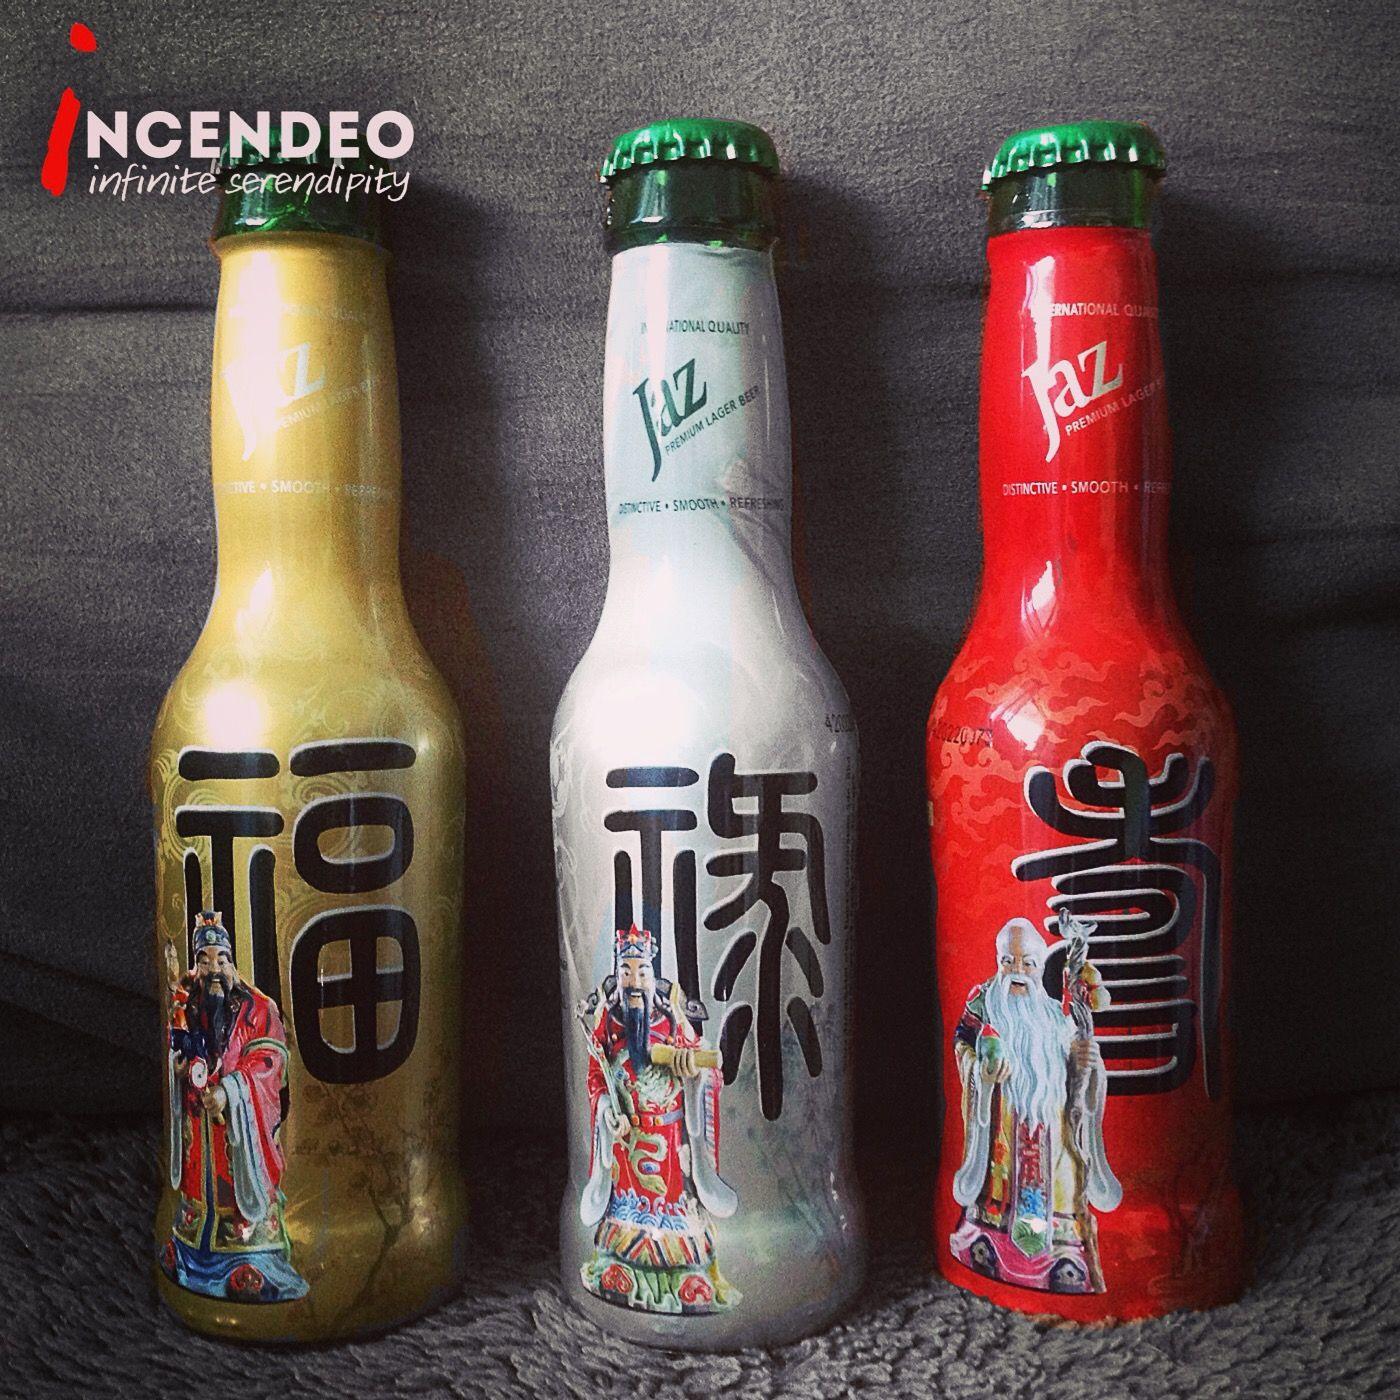 Jaz Beer 2010 Chinese New Year 福祿壽 Edition. jaz beer